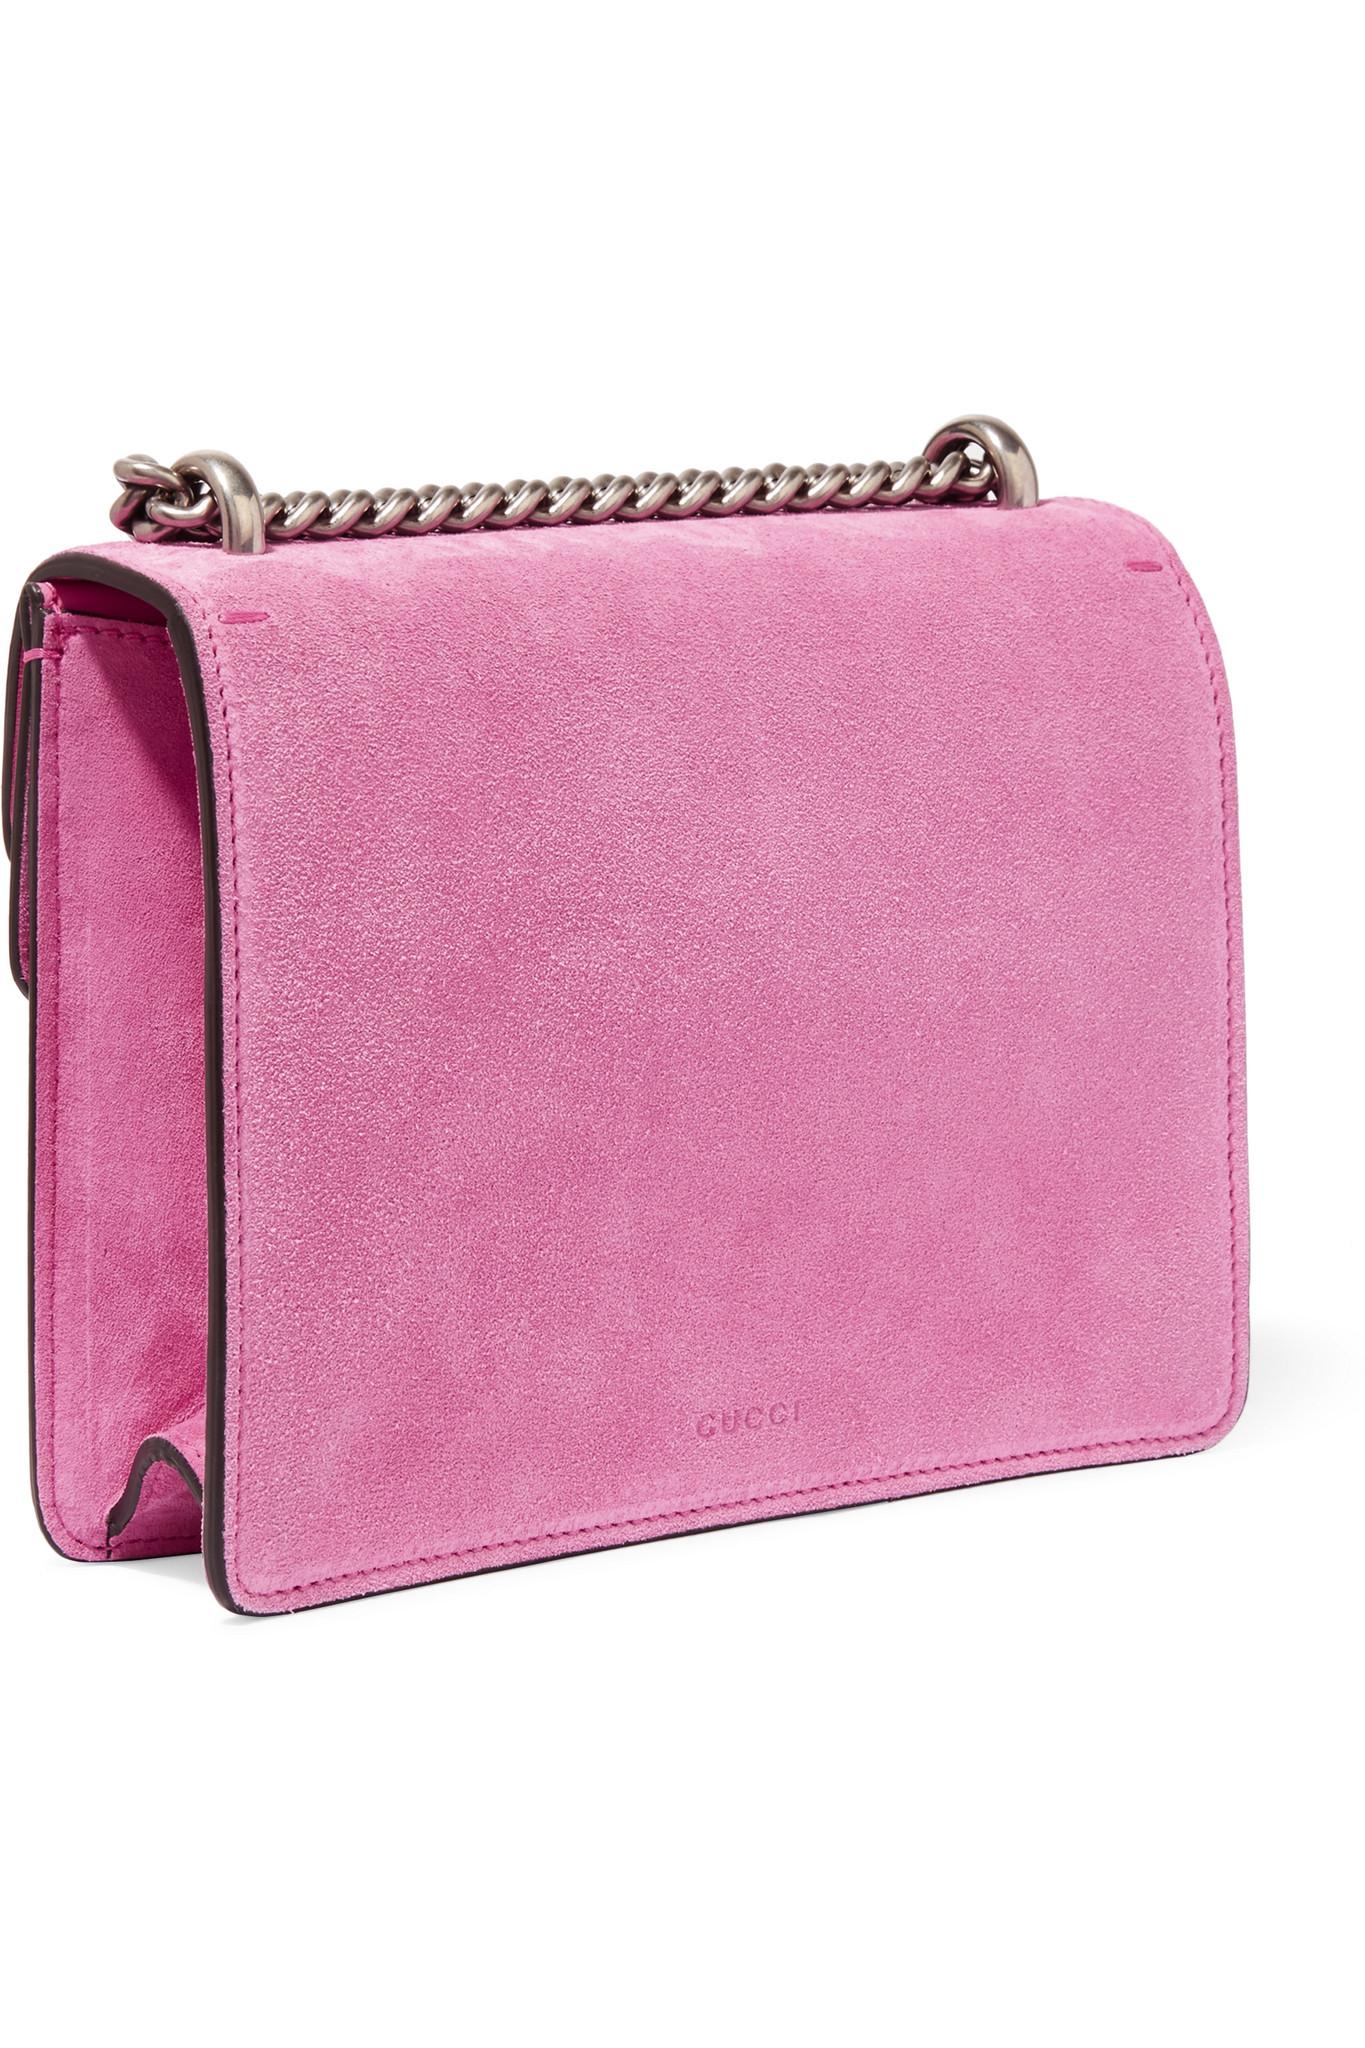 9e828c2bbb2a Gucci Dionysus Mini Suede Shoulder Bag in Pink - Lyst